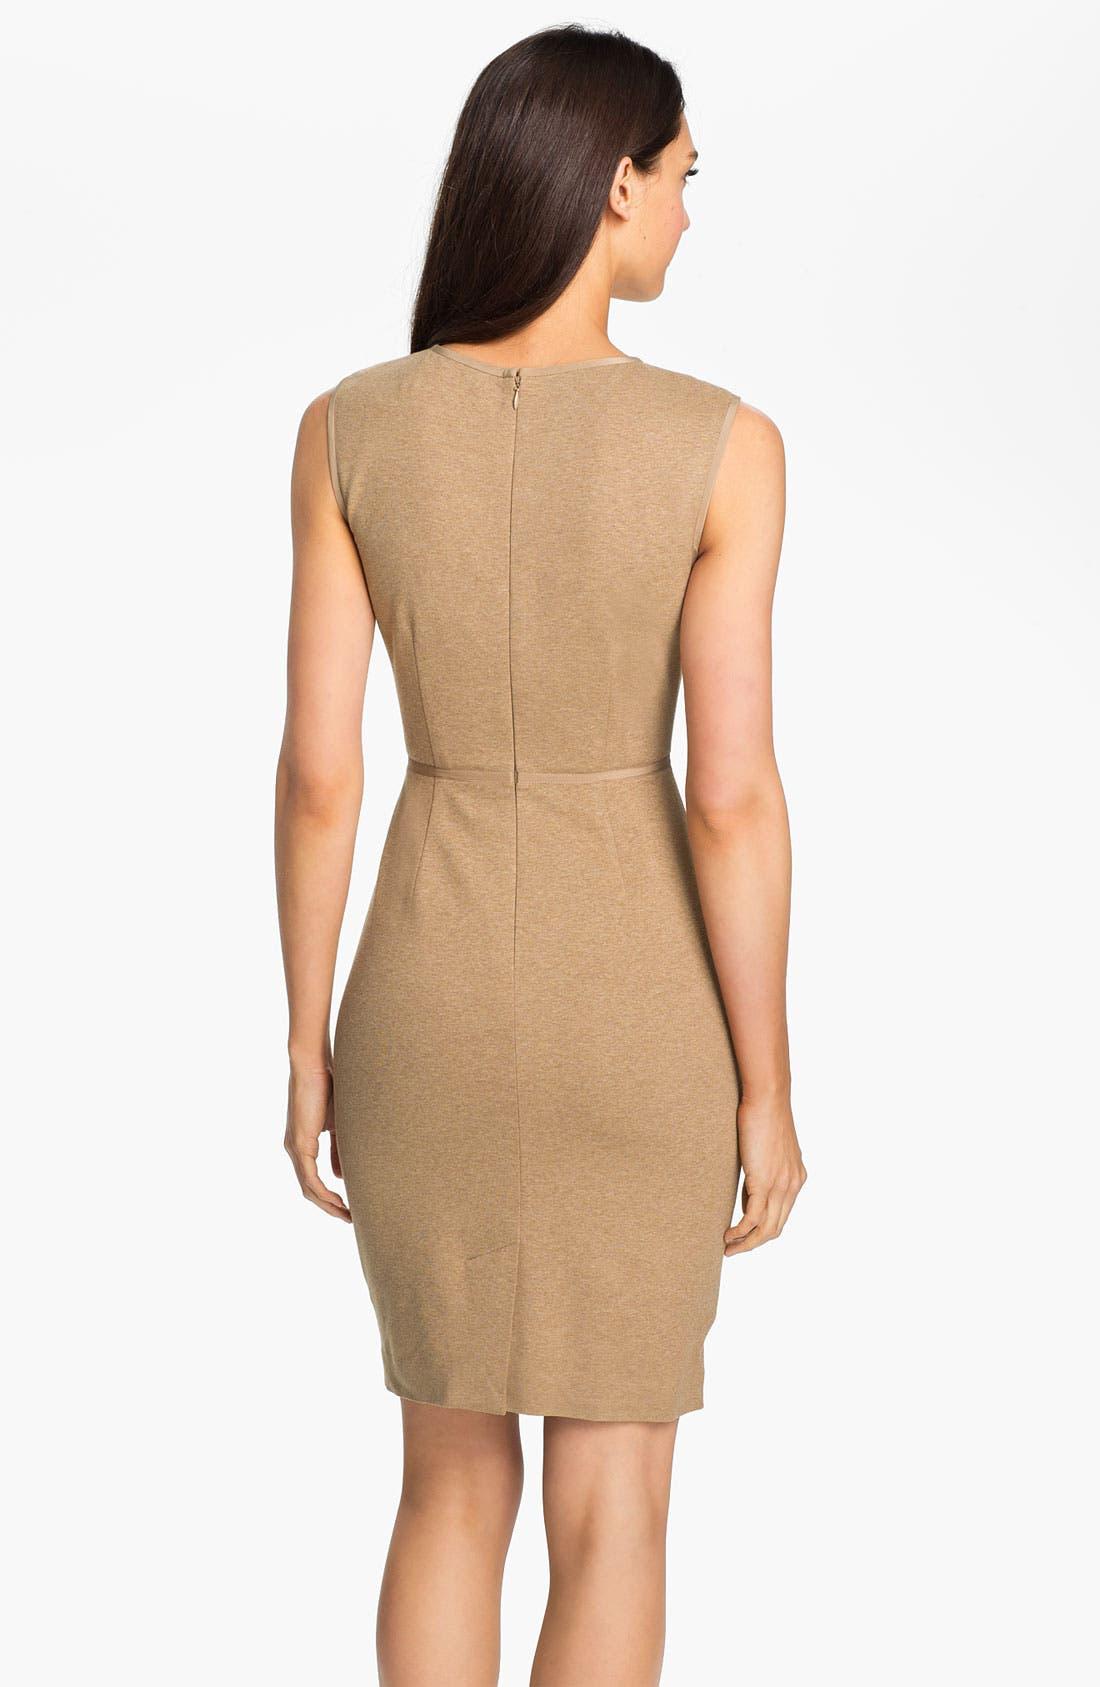 Alternate Image 2  - Trina Turk 'Myrna' Knit Sheath Dress